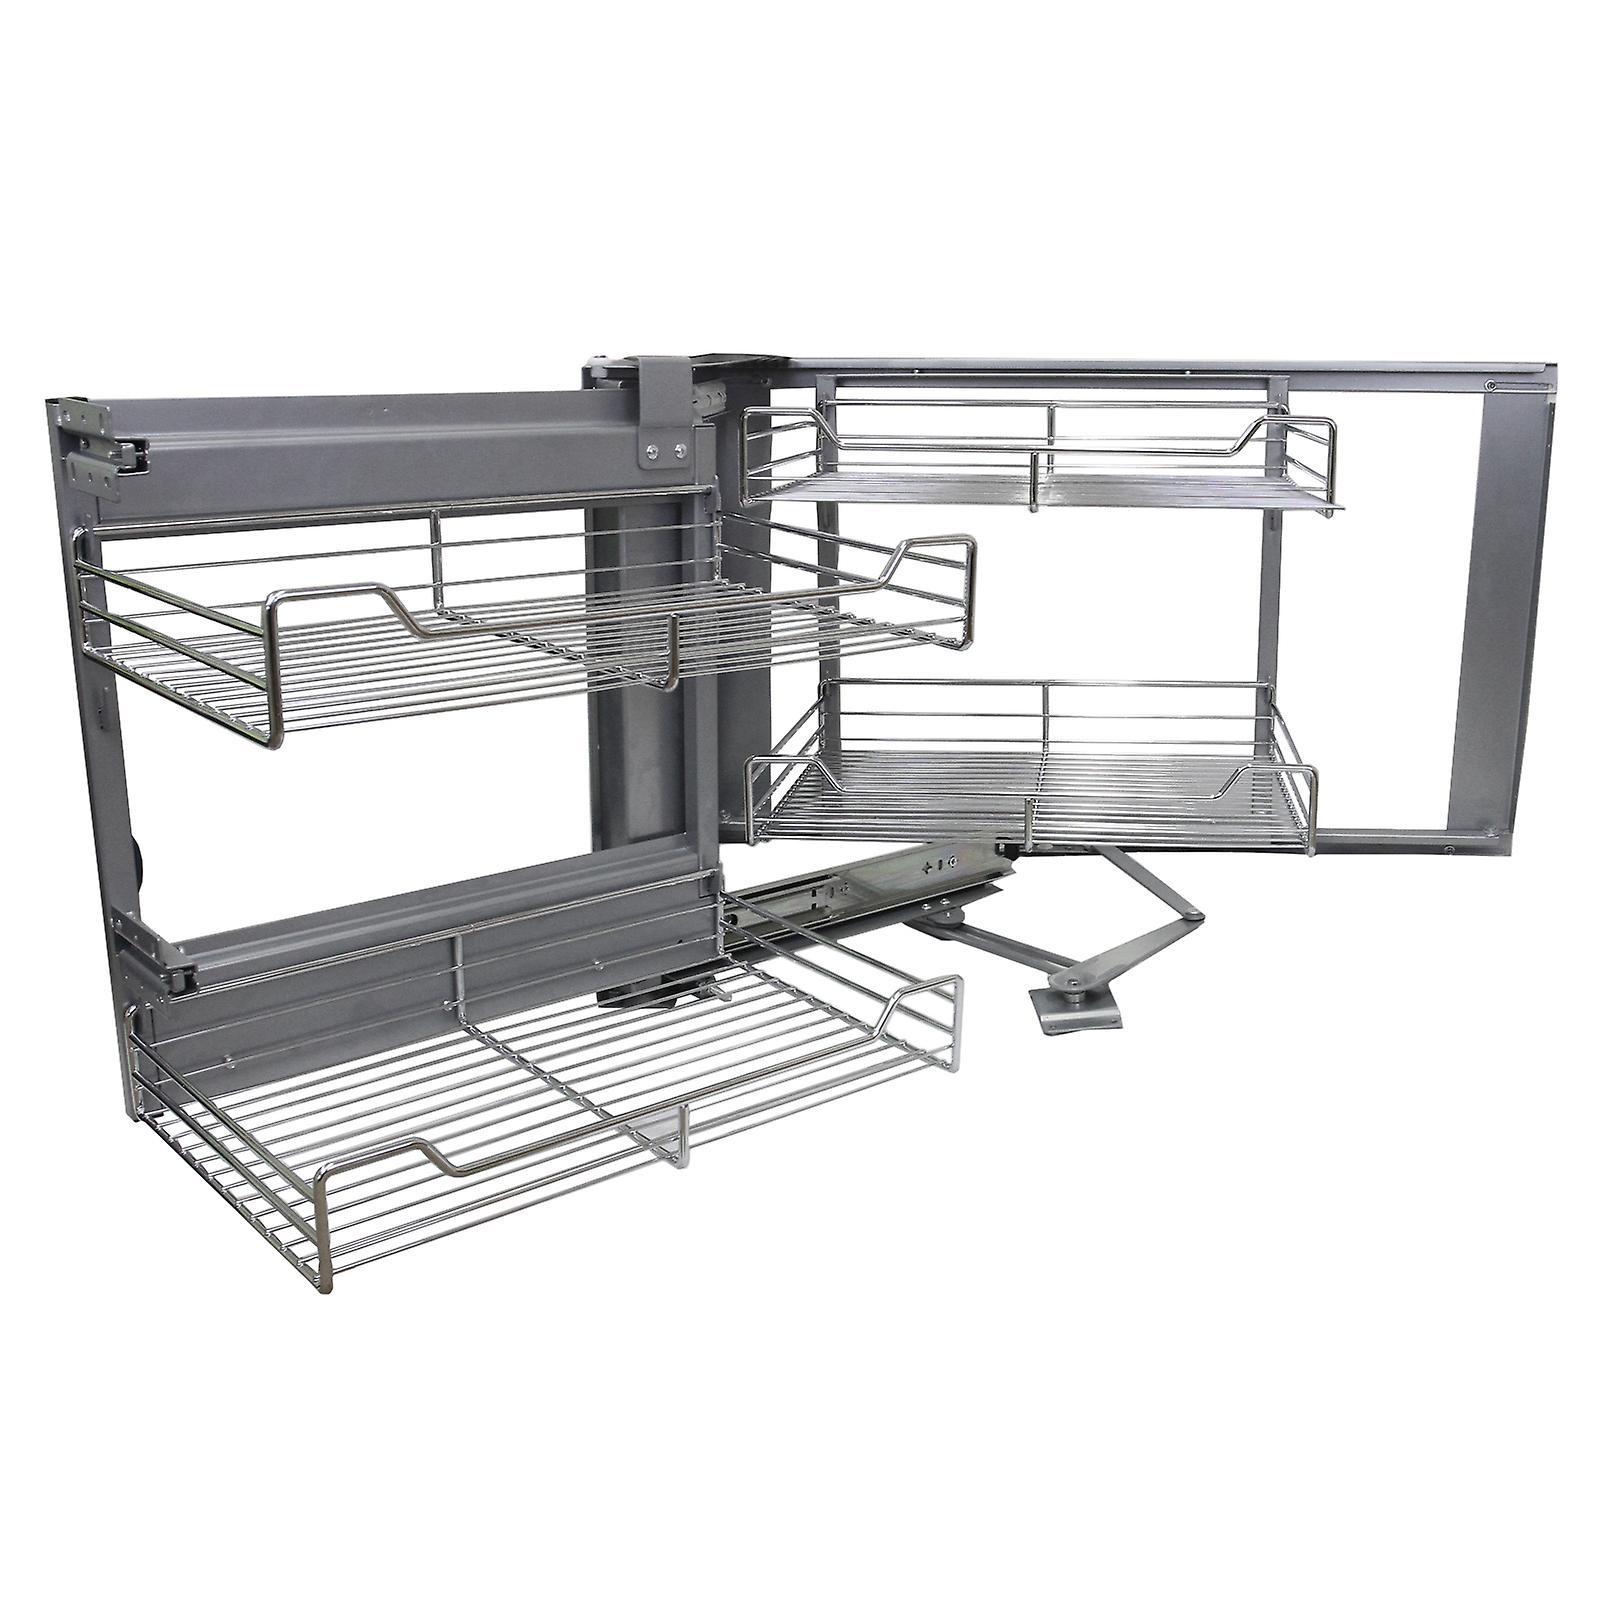 KuKoo Ecke Küche Schrank herausziehen Schubladen - links/rechts